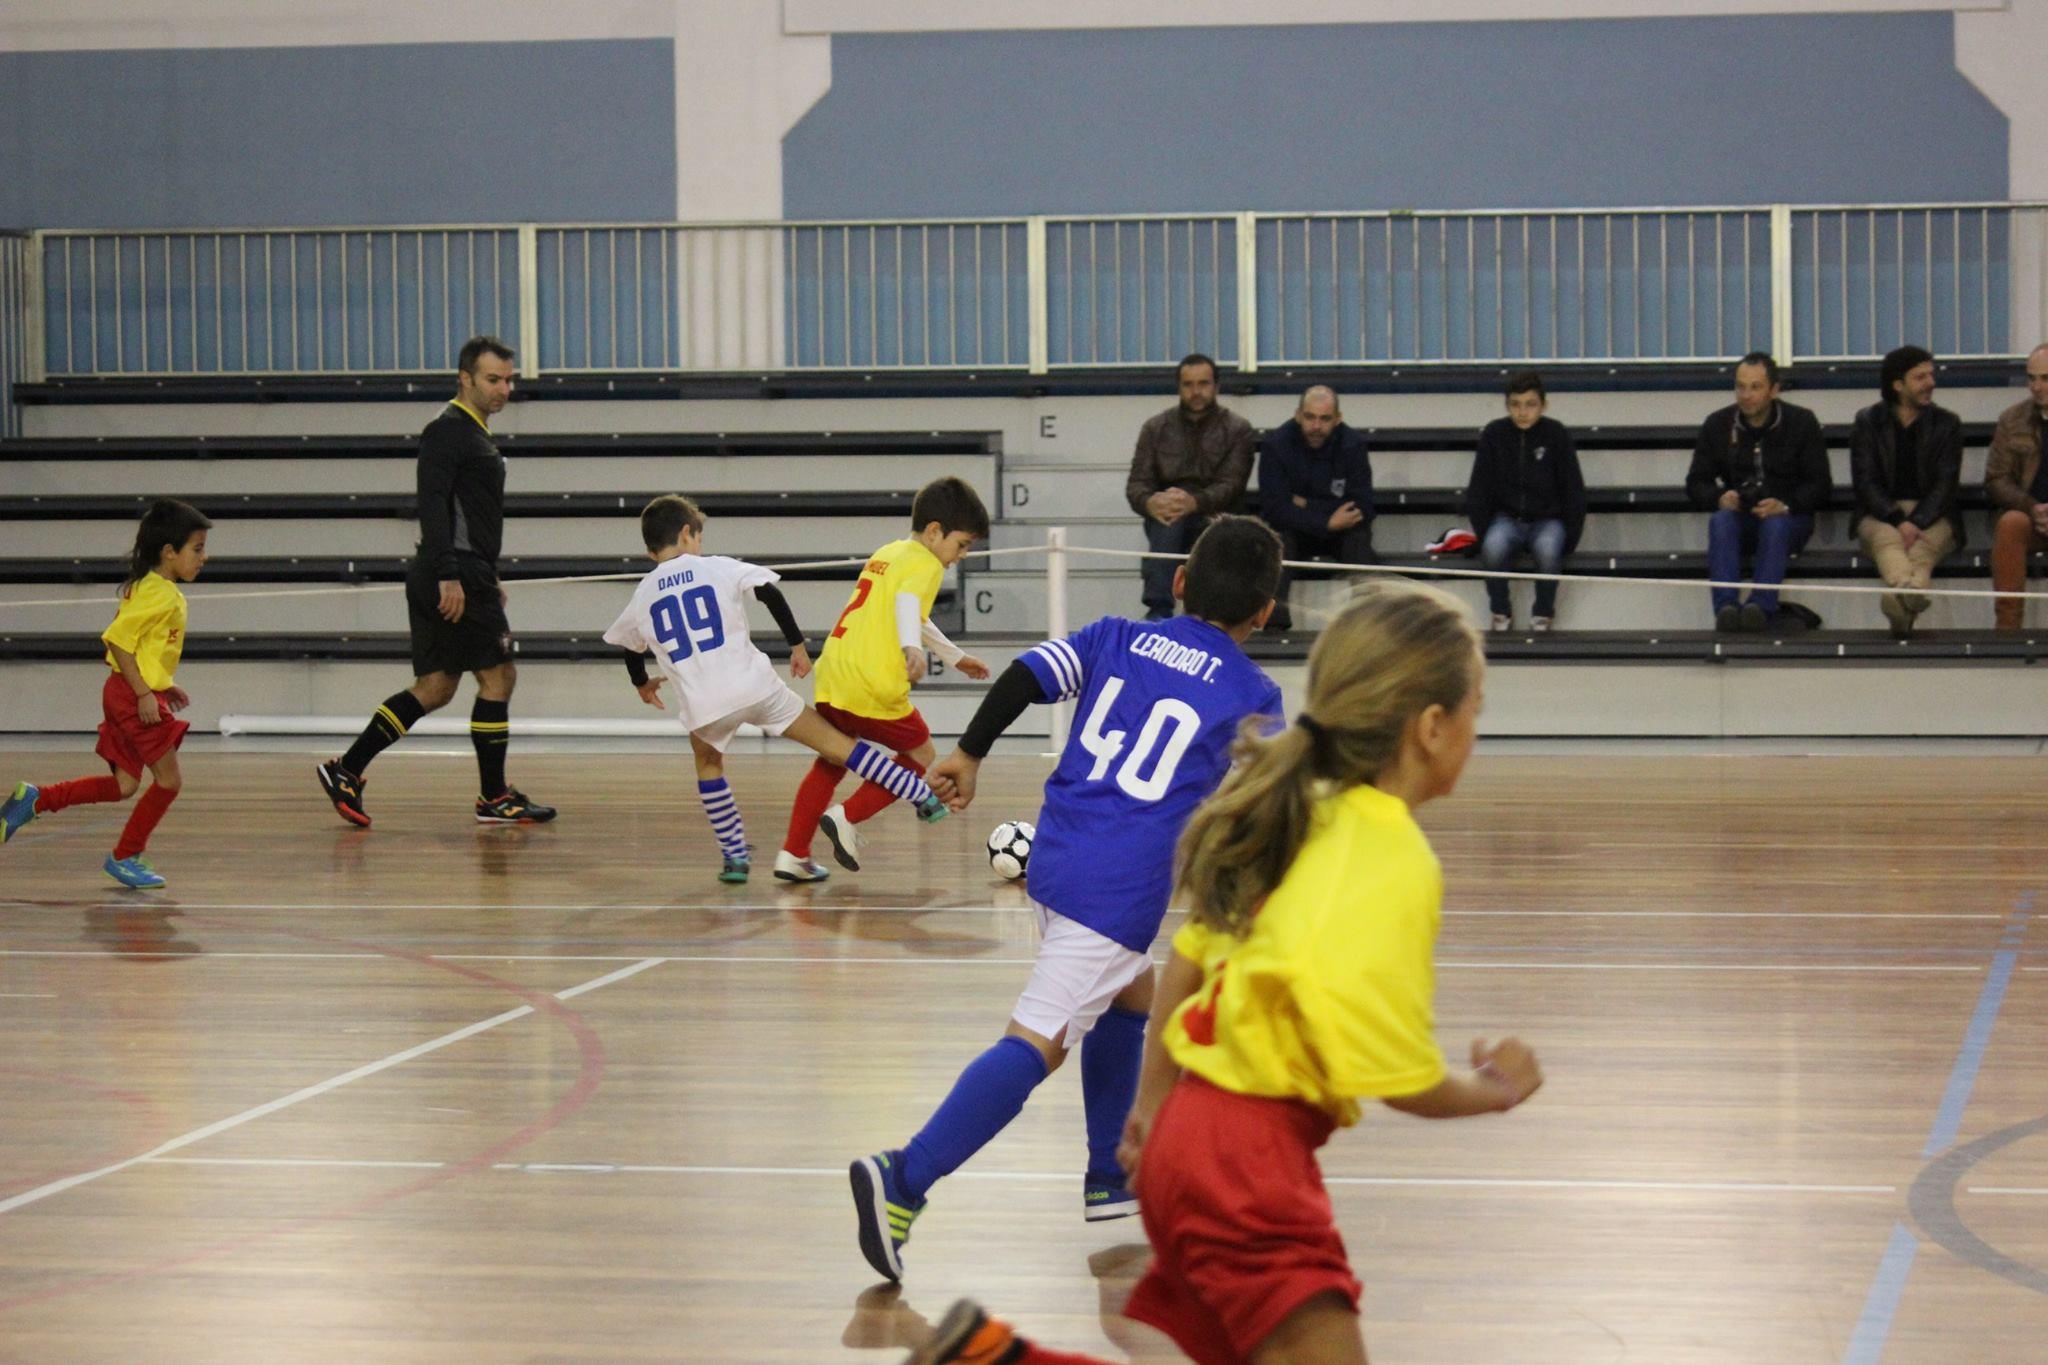 JIF Torneio Futsal Traquinas 1 Jornada 1